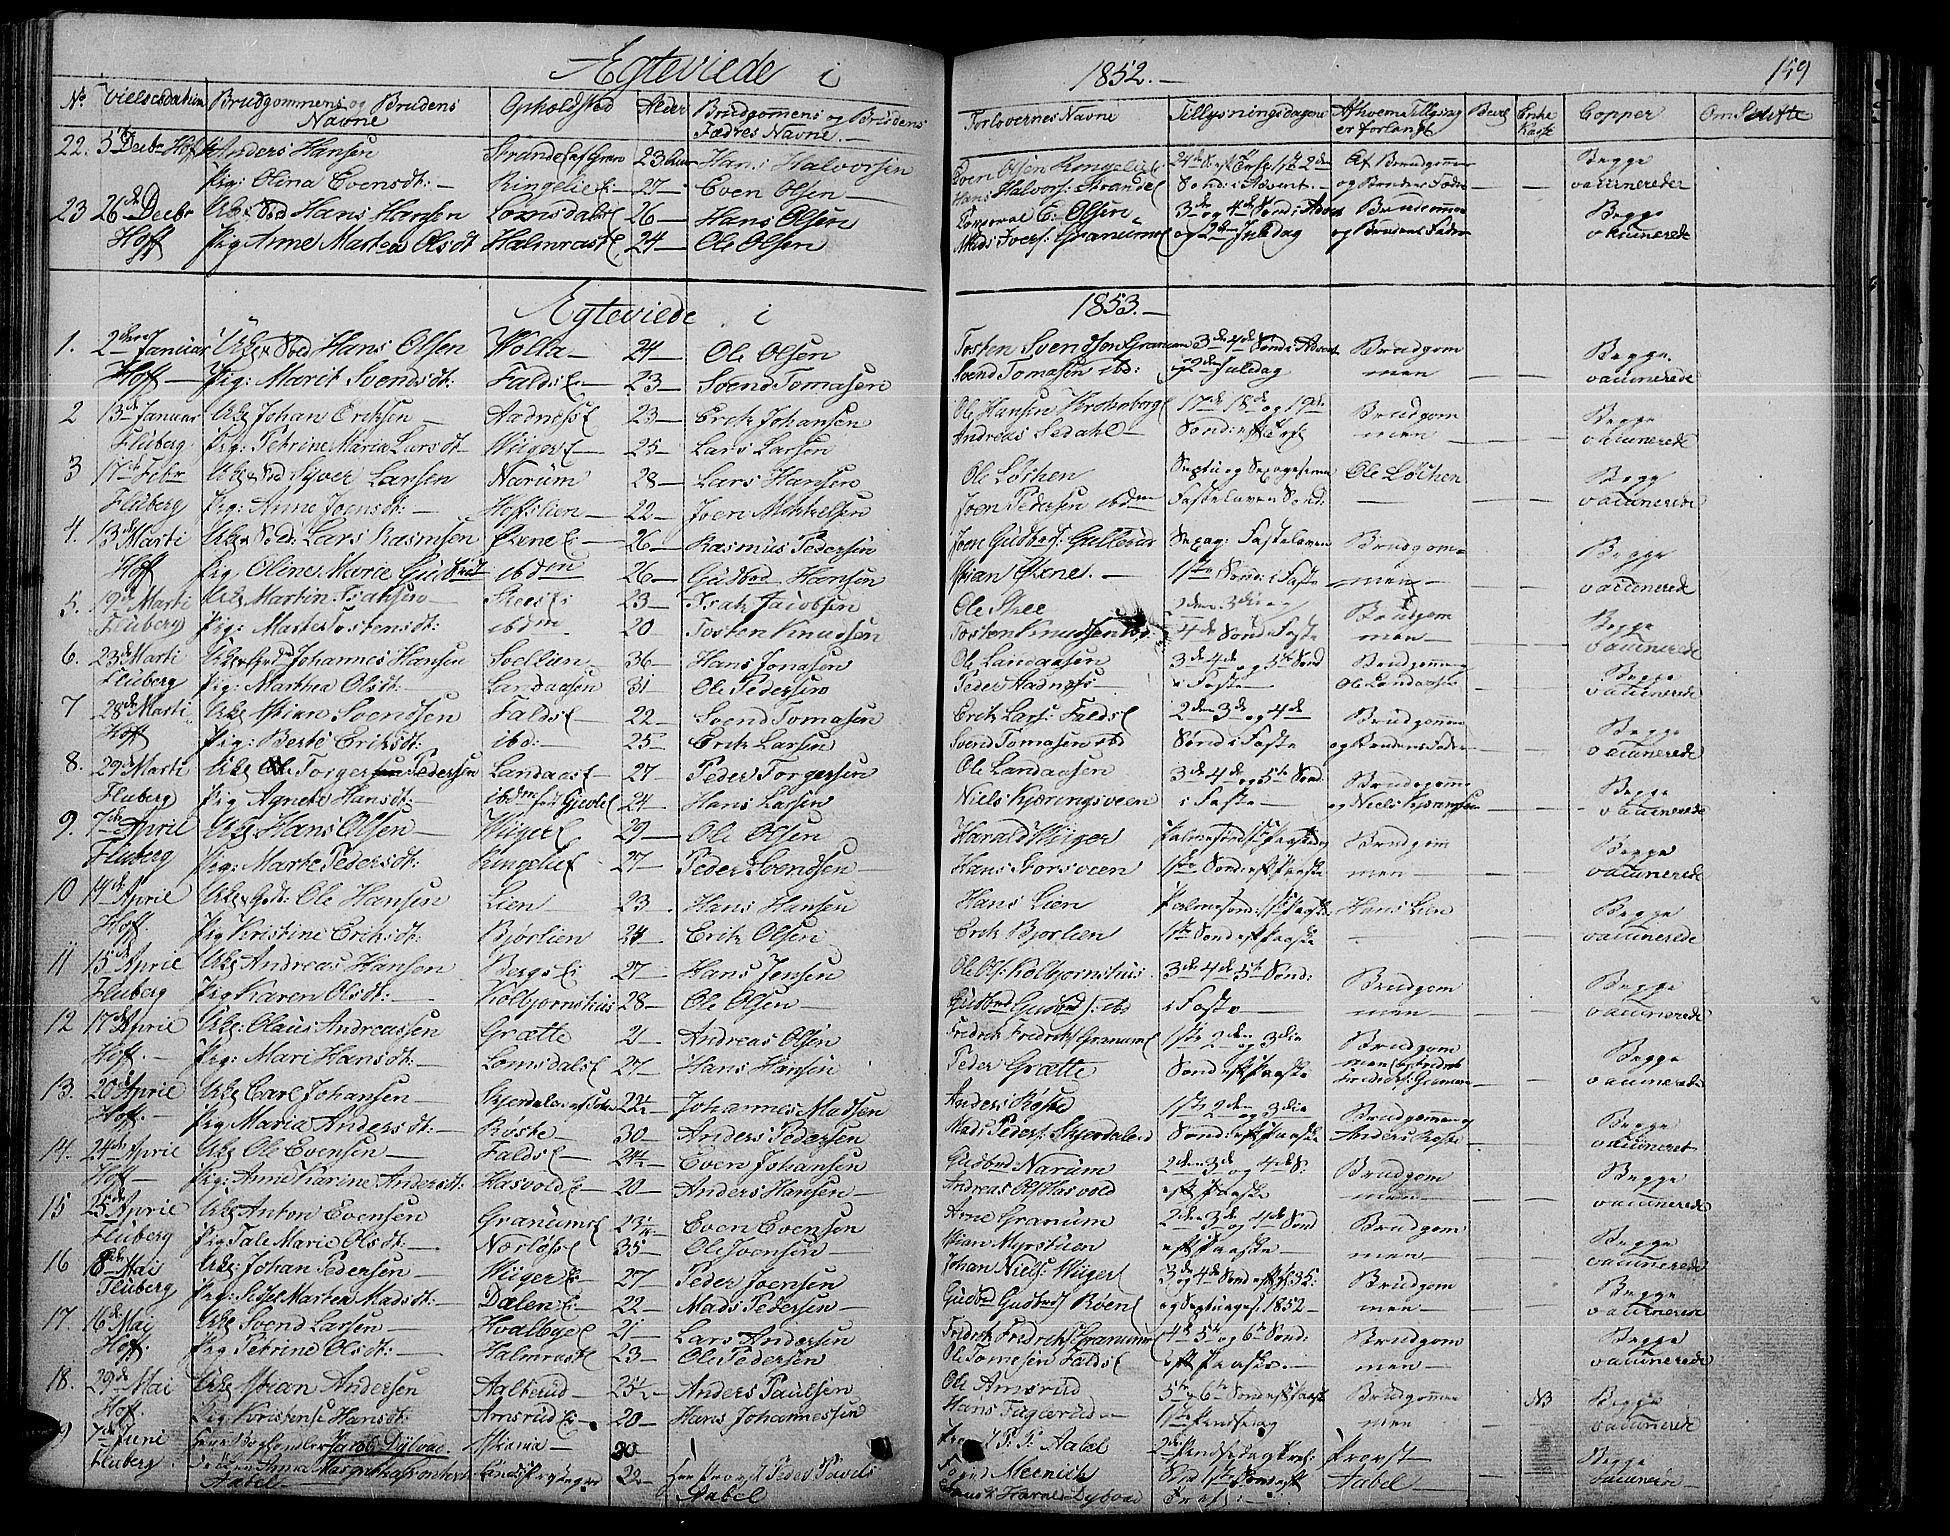 SAH, Søndre Land prestekontor, L/L0001: Klokkerbok nr. 1, 1849-1883, s. 159